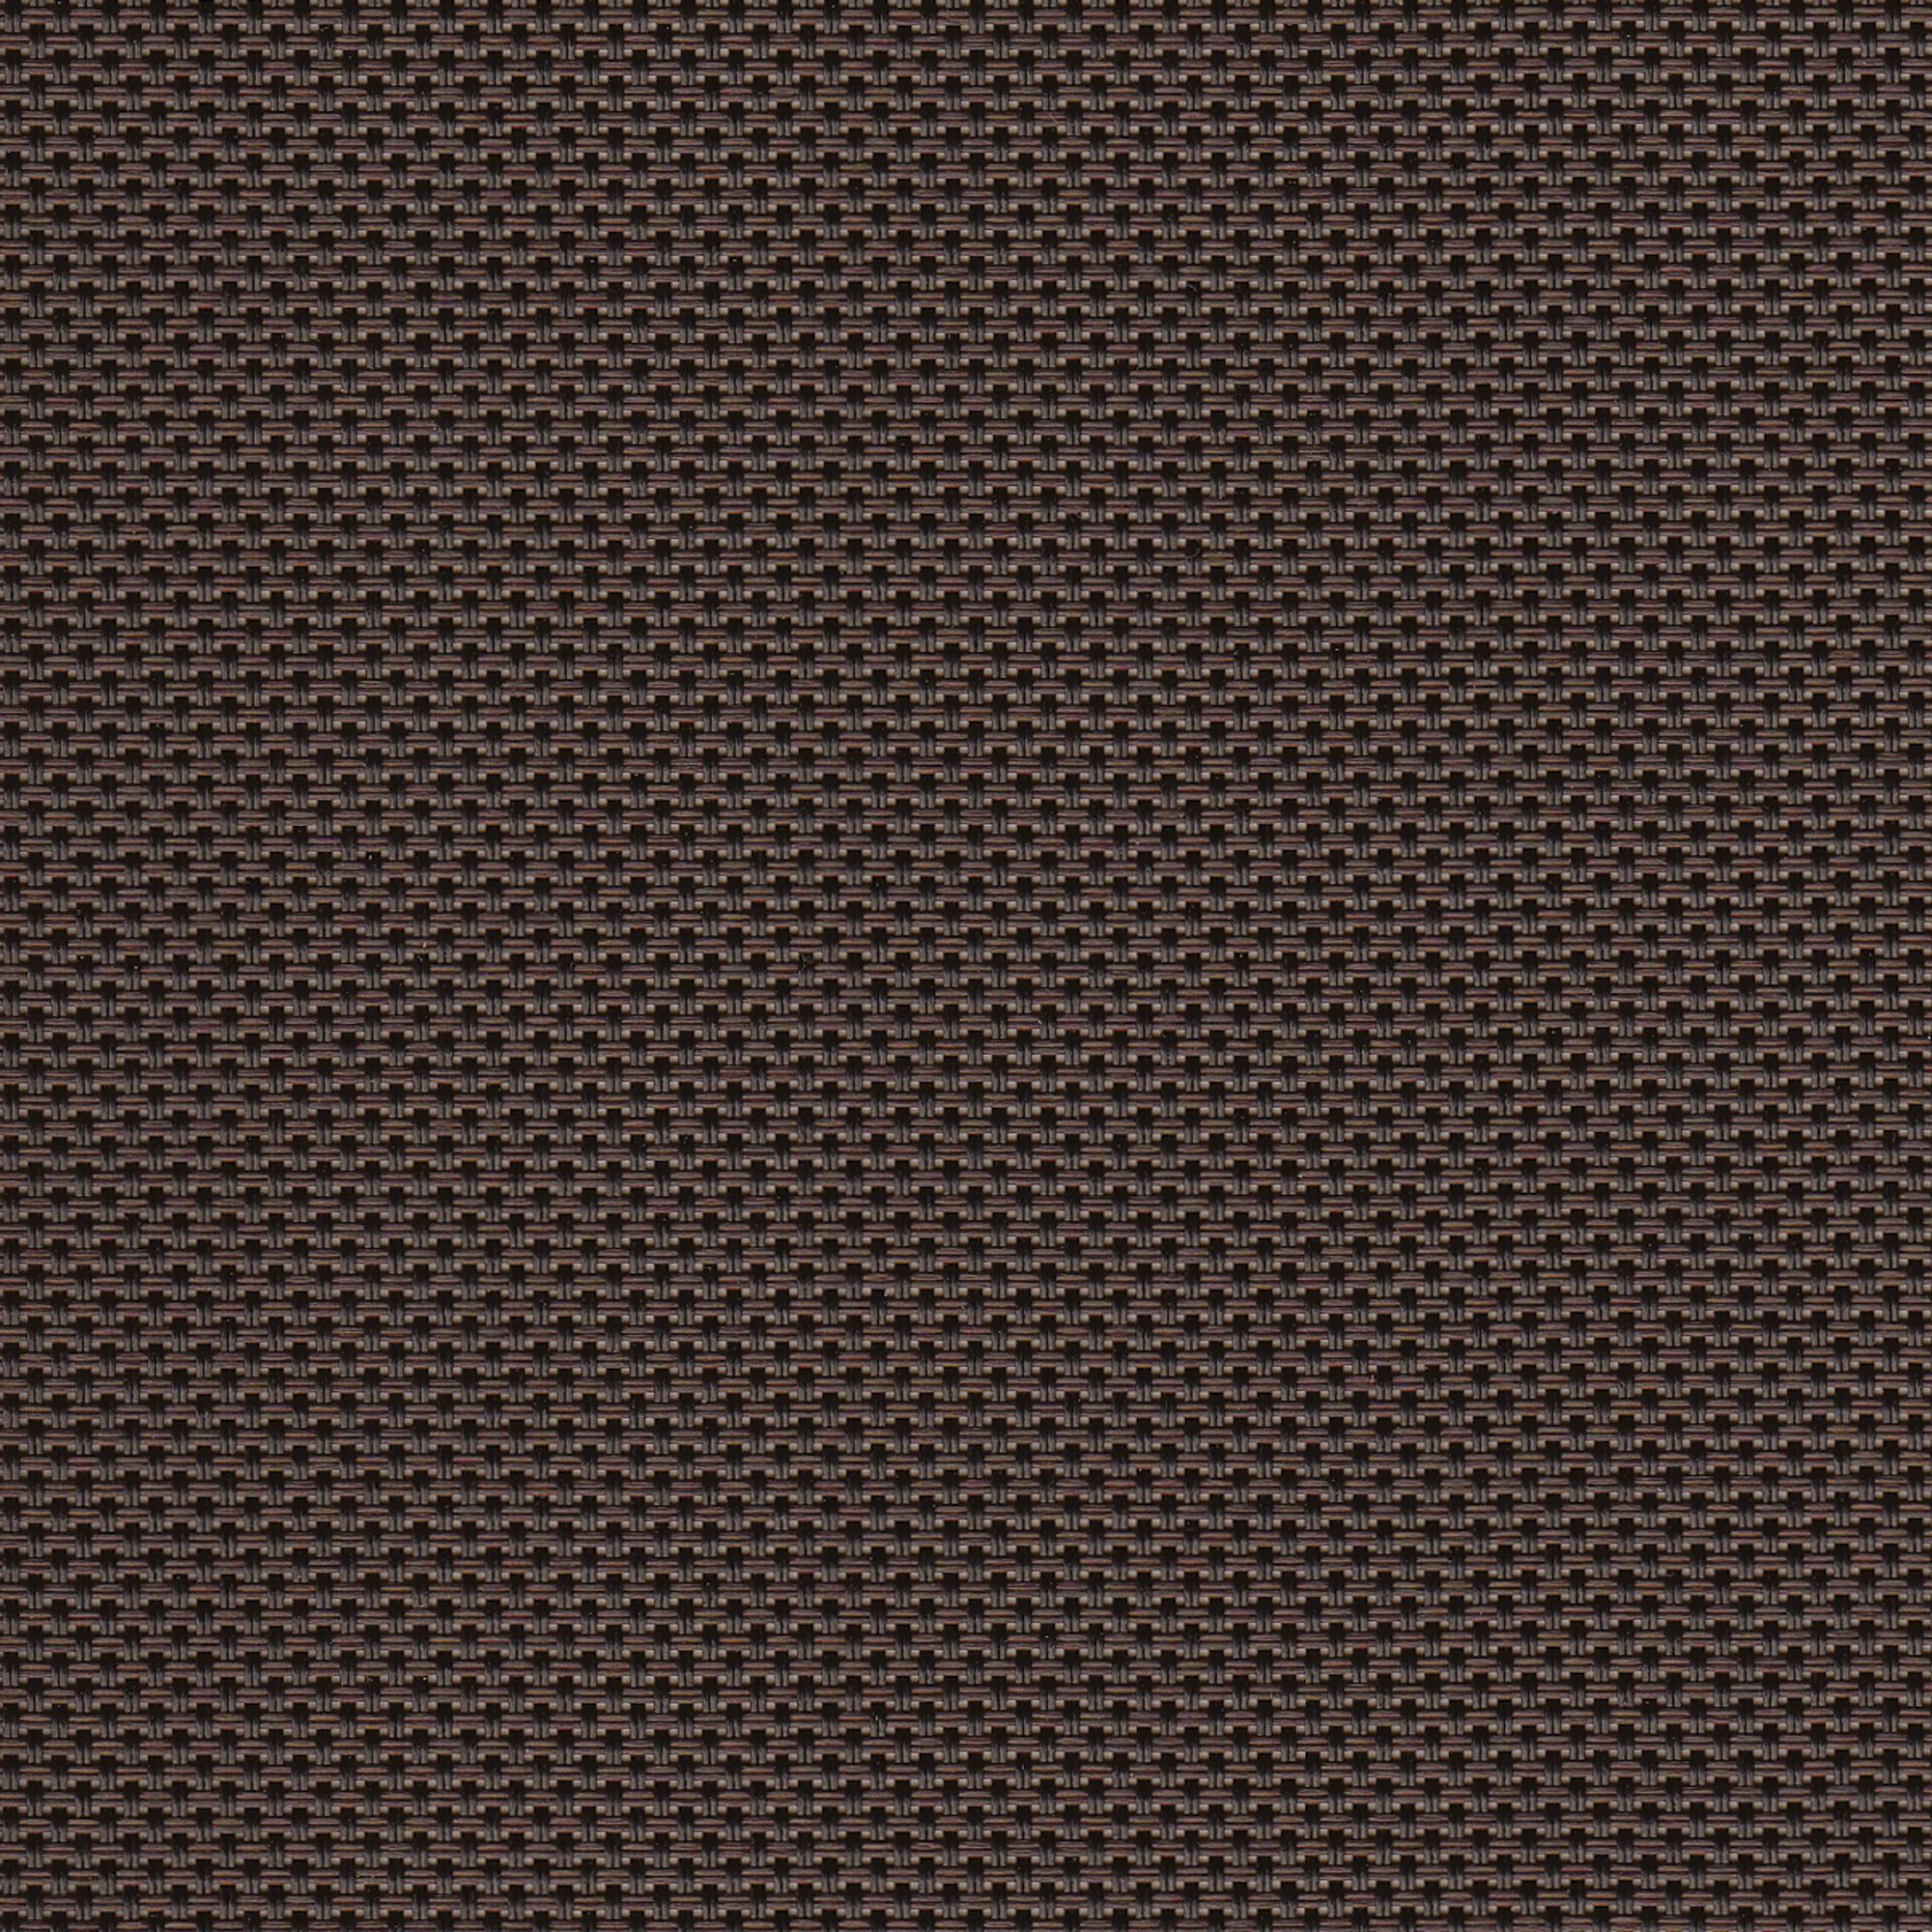 Nordic Screen BW Black-Bronze